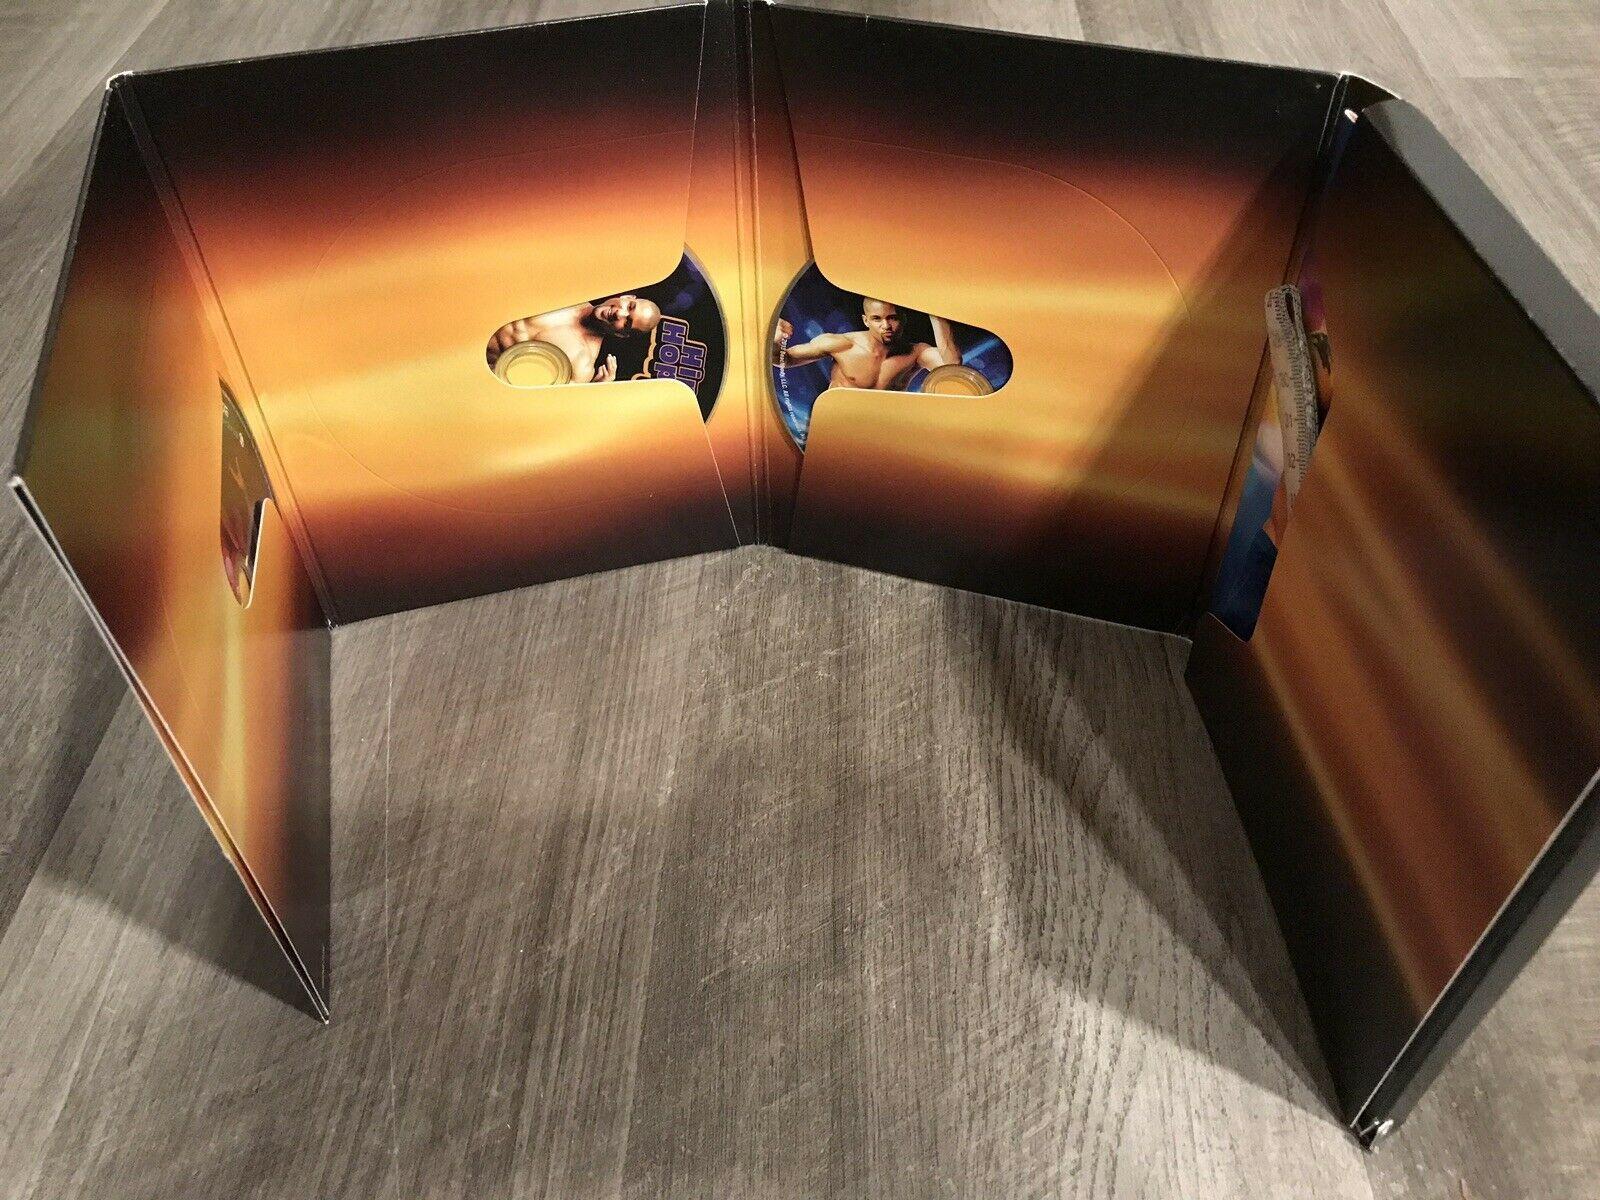 Beachbody Hip Hop ABS 3 DVD SHAUN T'S HIP HOP ABS ULTIMATE AB SCULPTING SYSTEM image 5